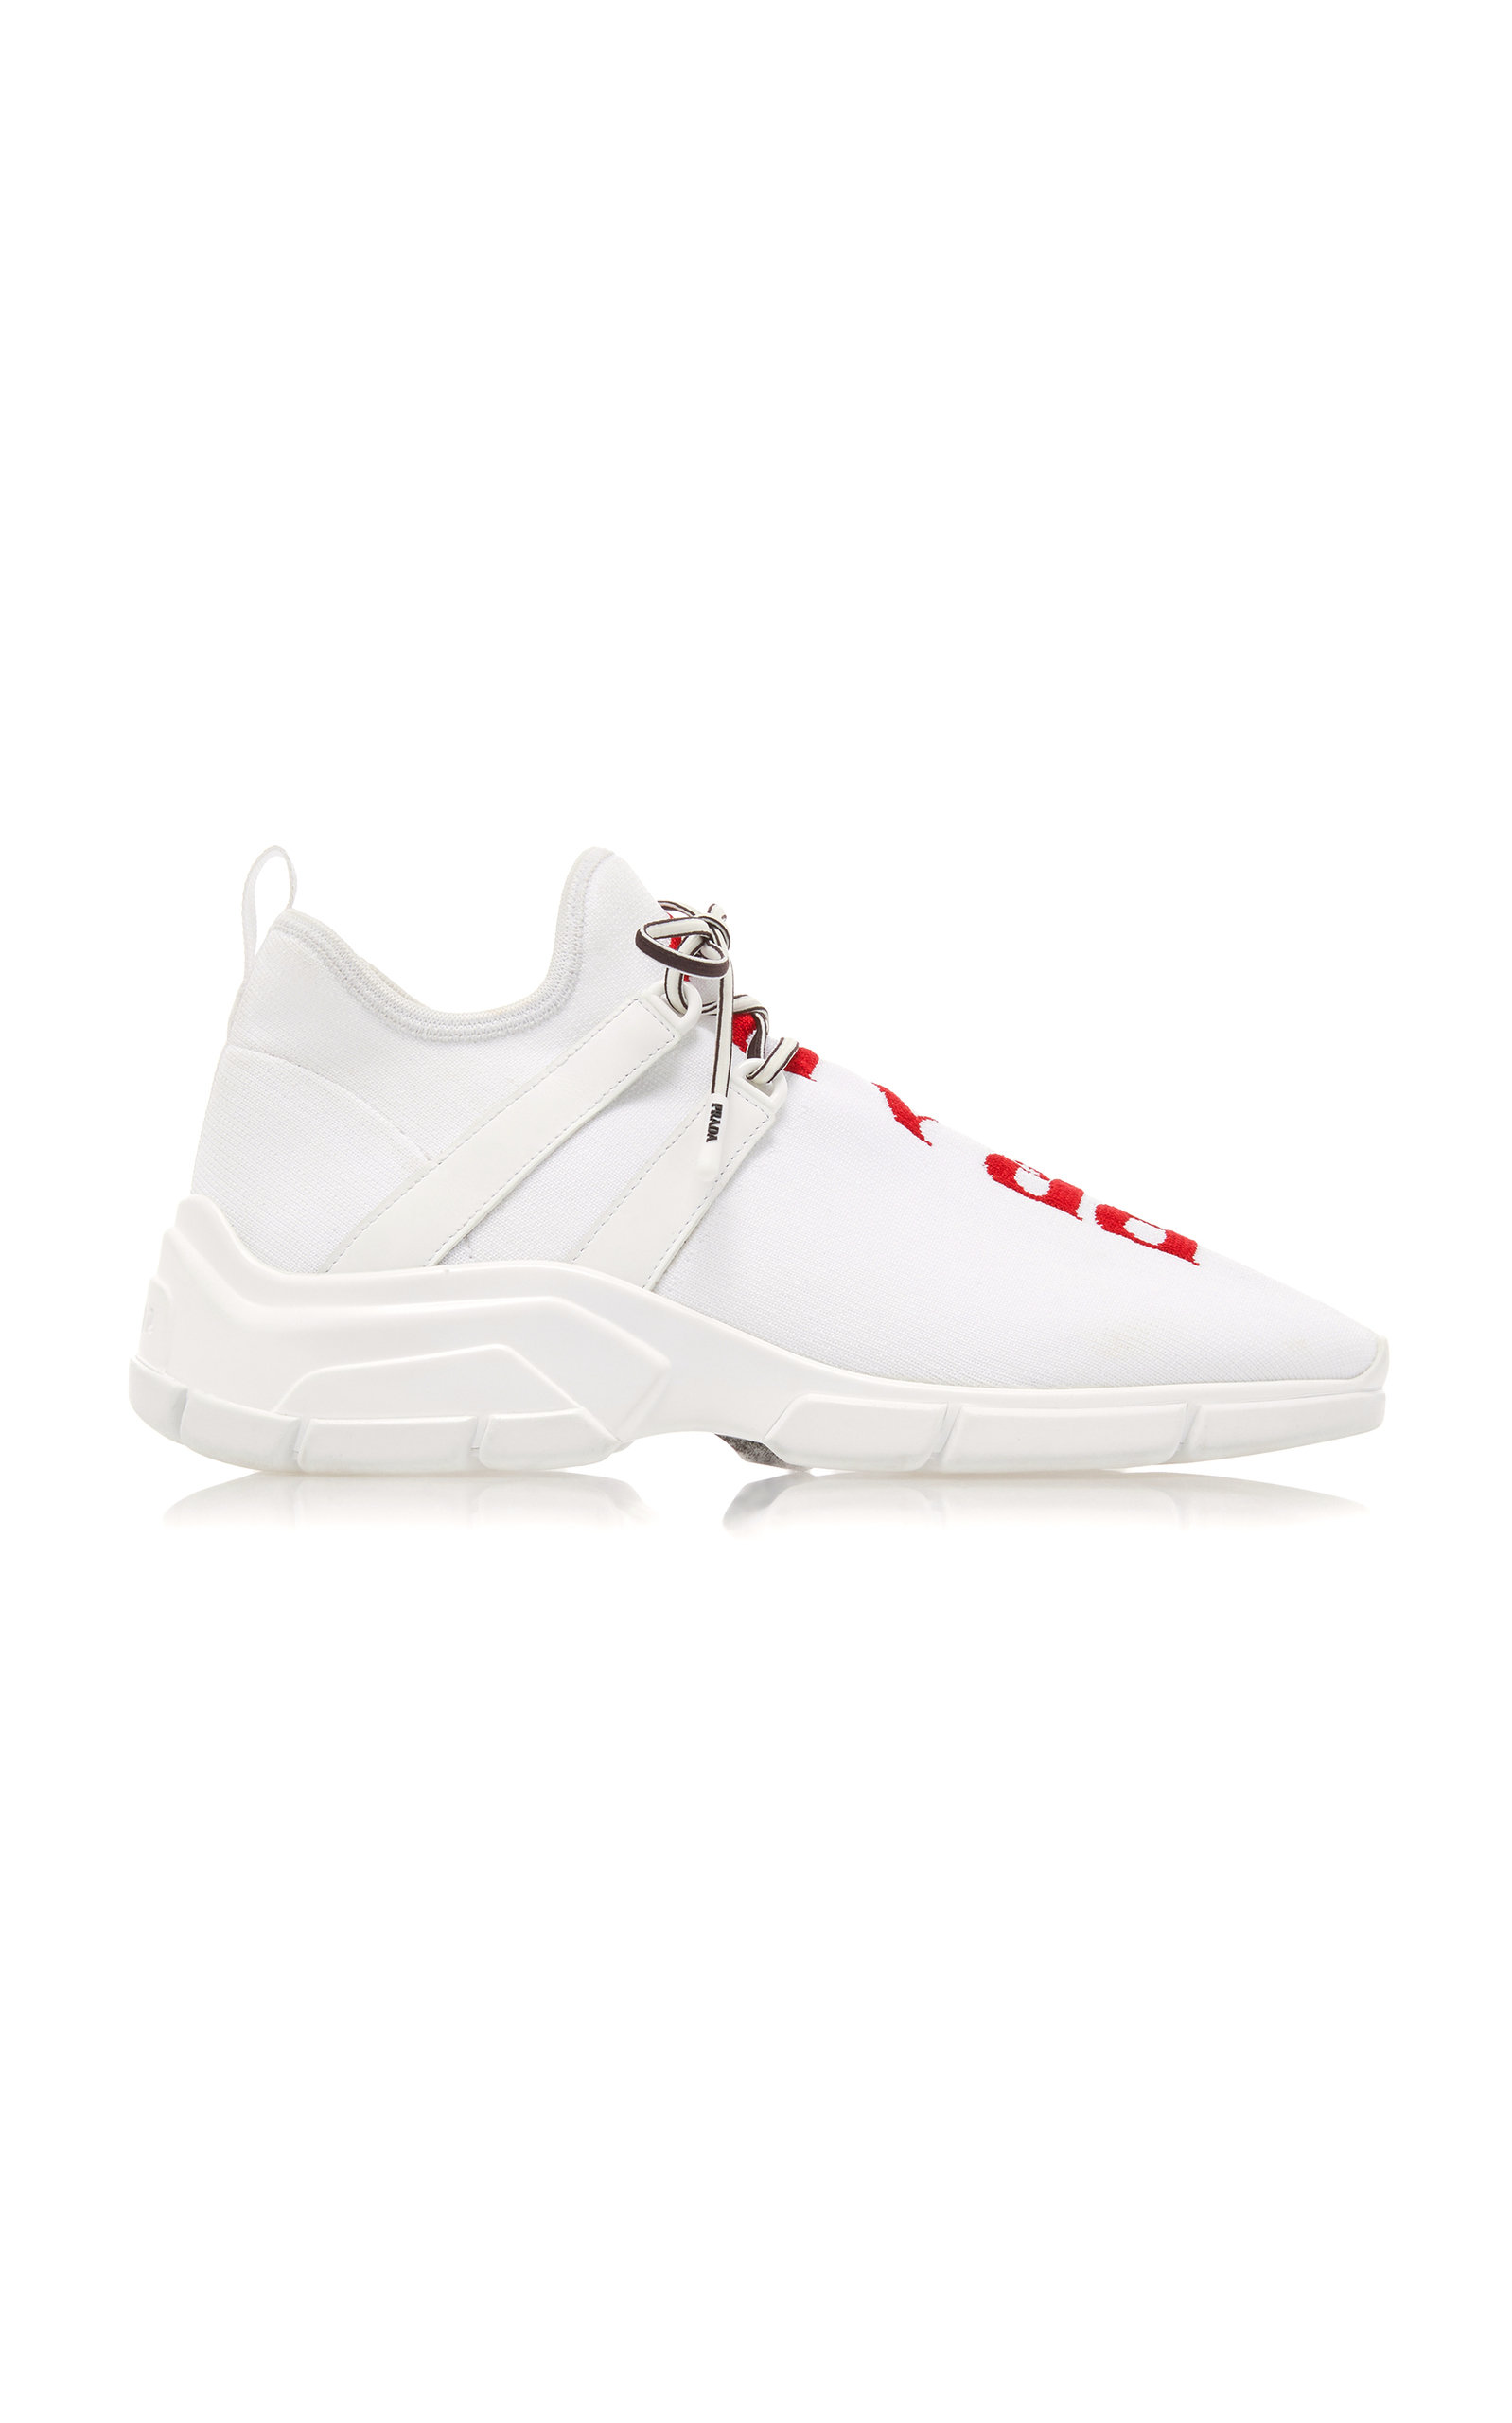 53033ffdfc Logo Knit Sneakers